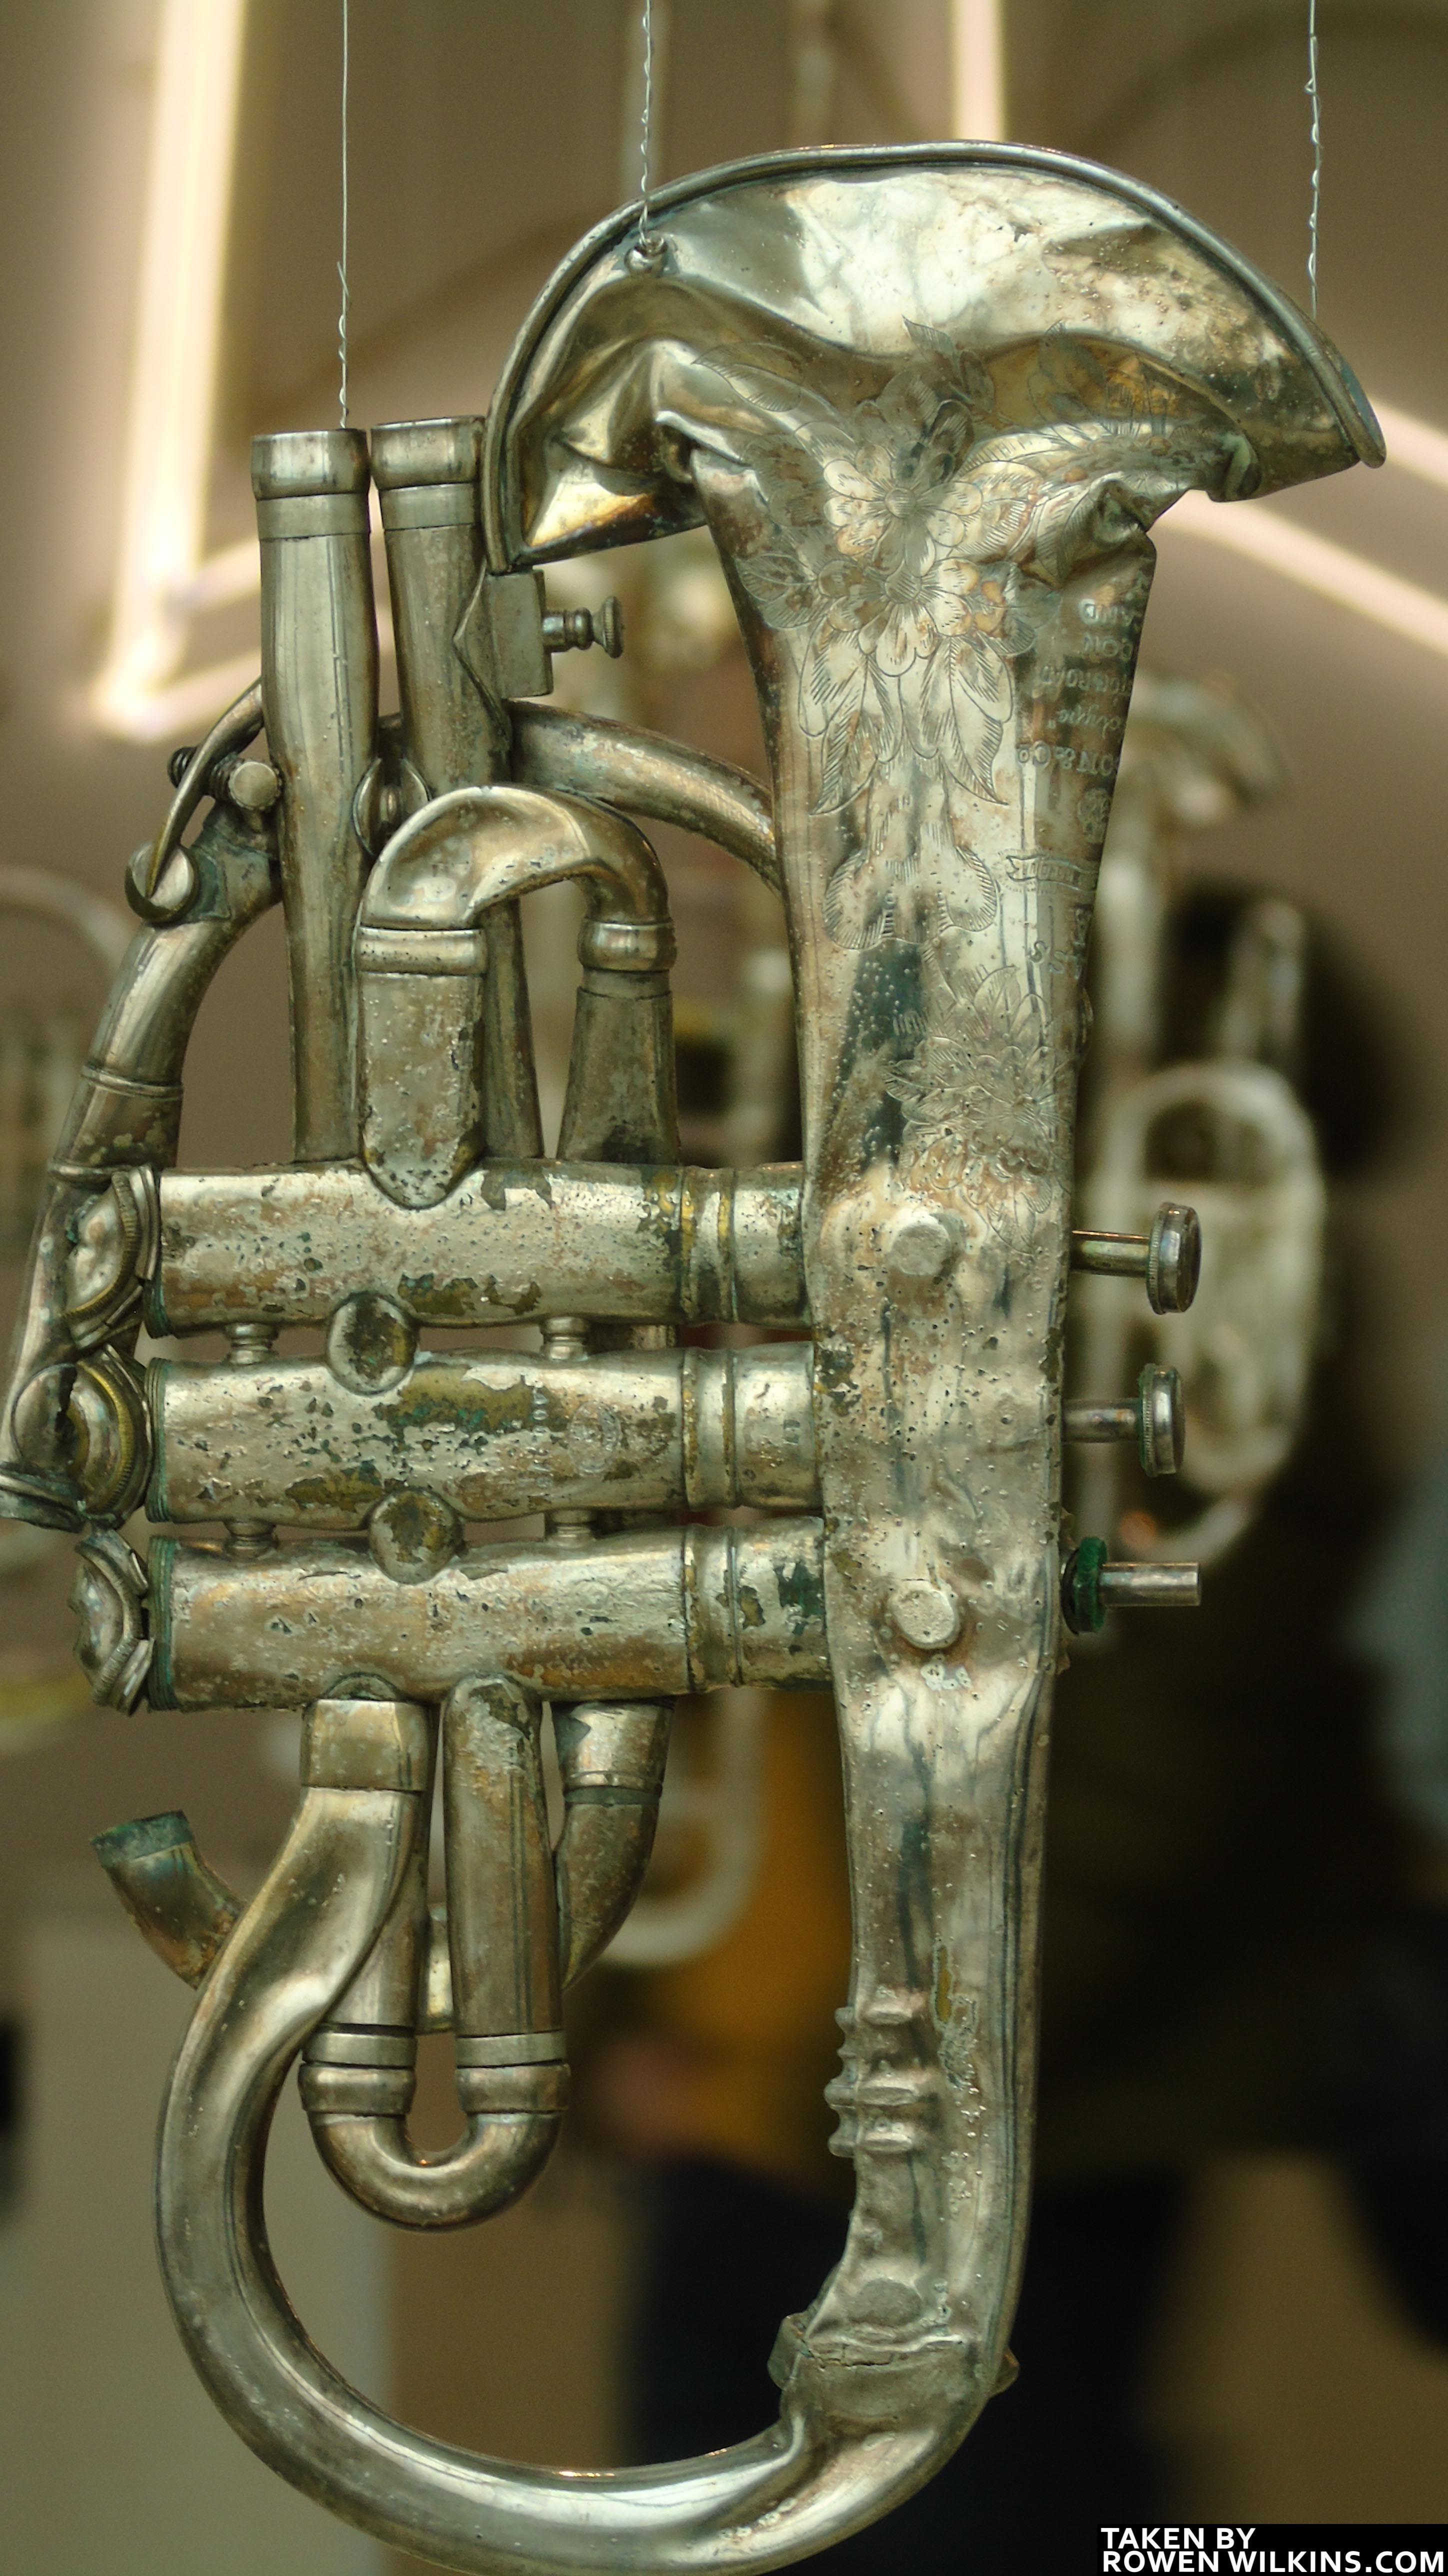 #rowenwilkins #uk #trumpet #trumpets #lighting #musically #photography #photo #photographylovers #photographylife #photographyart #photographyislife #photographyeveryday #photographyisart #streetphotography #musical #instrument #music #artoftheday #arts #art #artwork